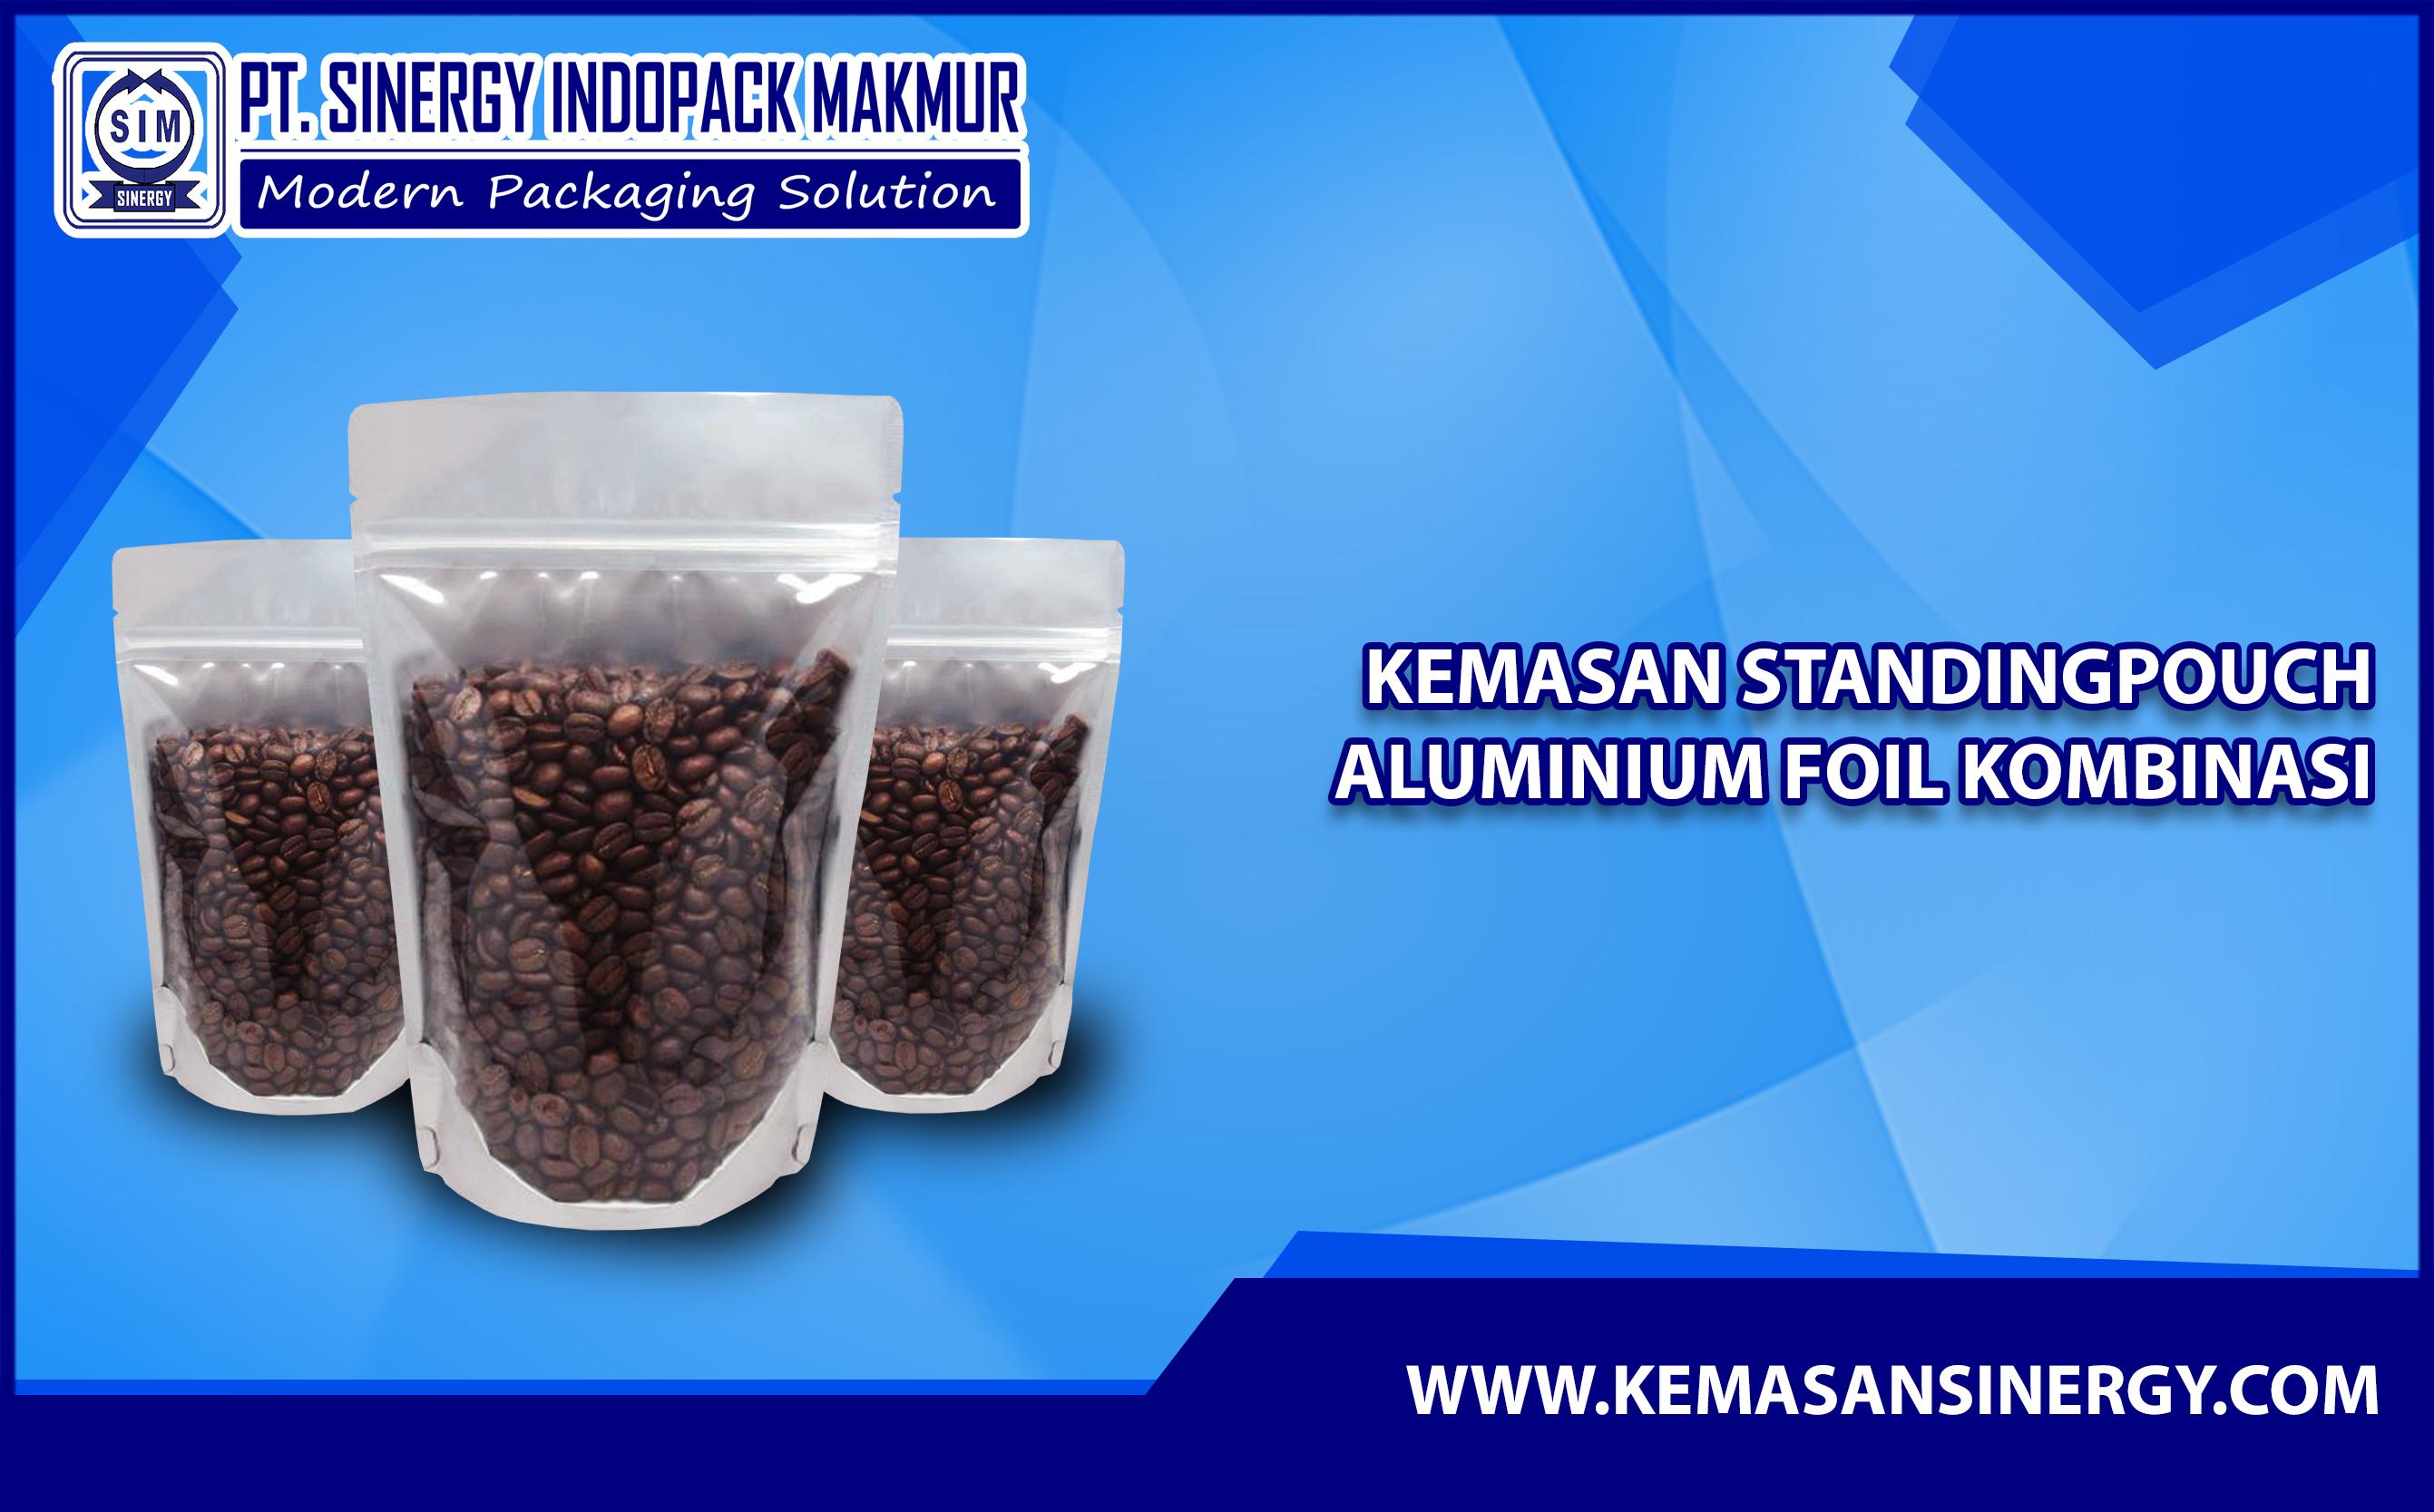 Kemasan Aluminium Foil (Alu Foil Standing Pouch Kombinasi)